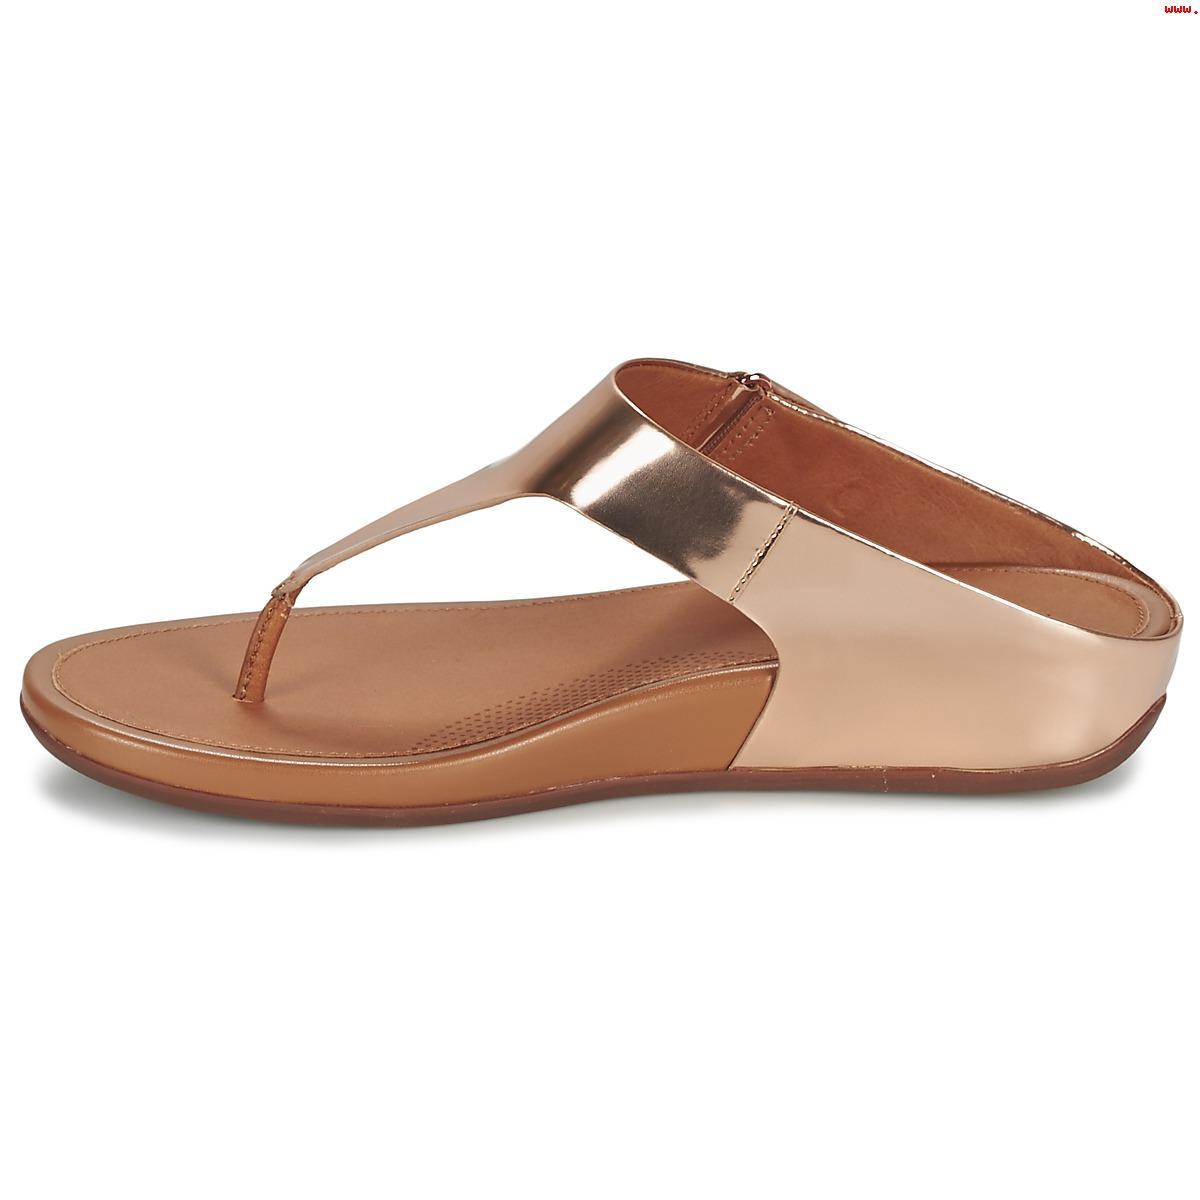 Chaussure tong femme pas cher